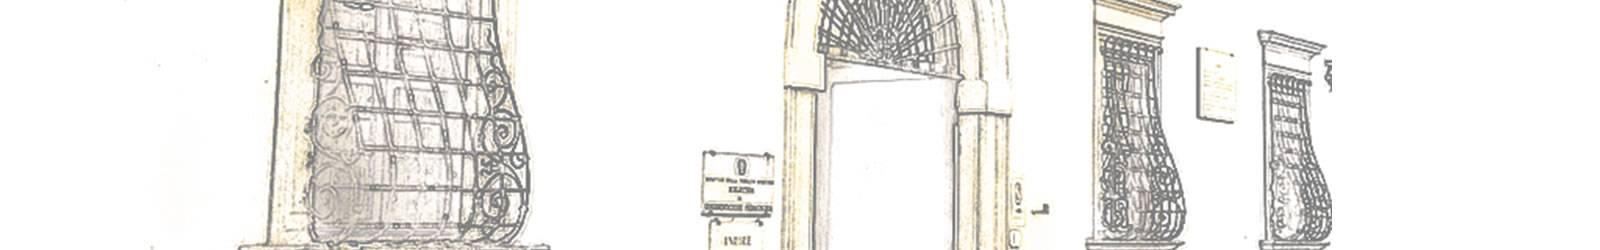 sede centrale Indire